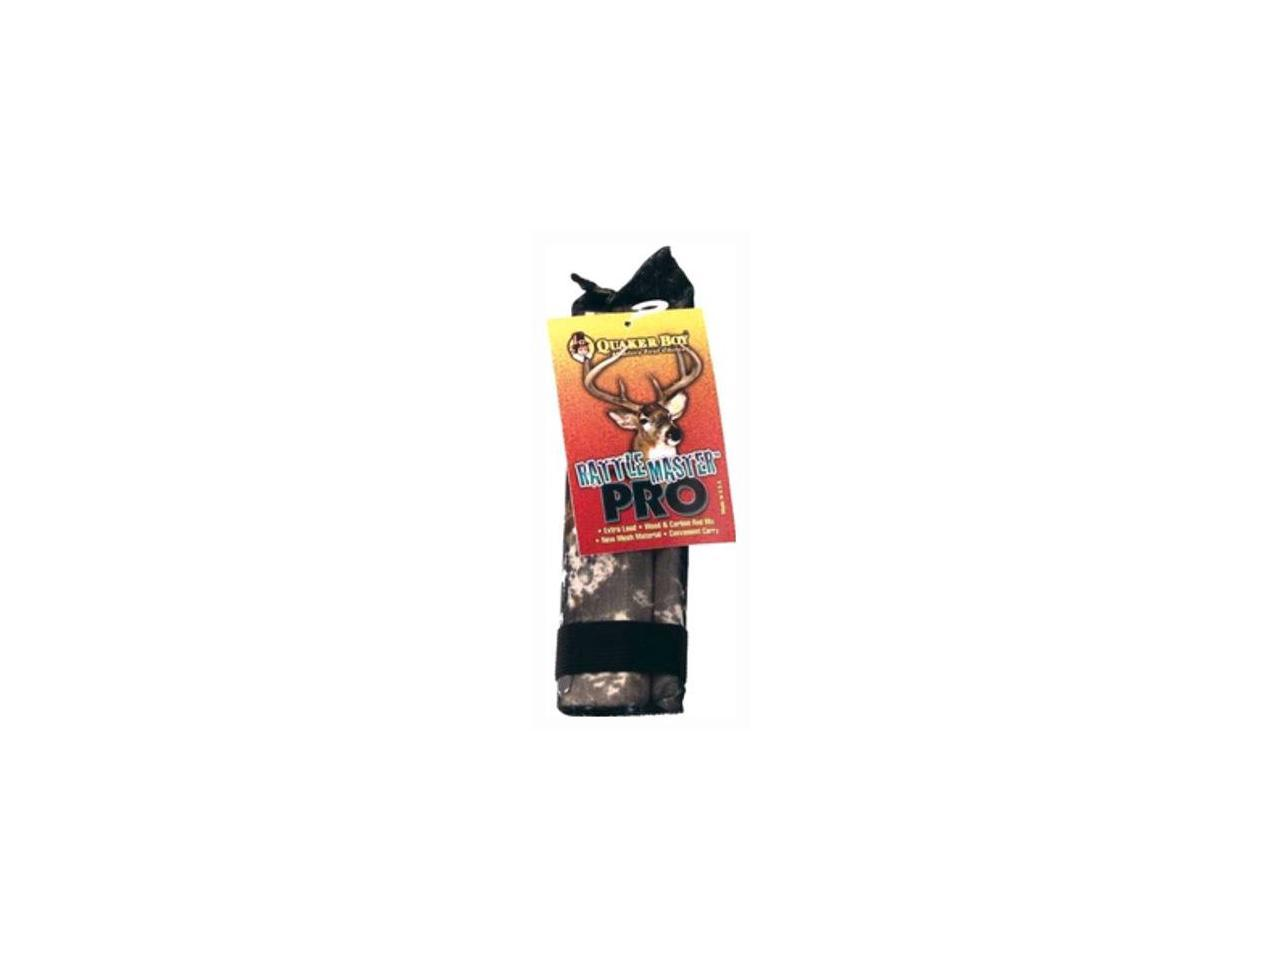 Quaker Boy Rattle Master Pro Deer Call 92611 for sale online